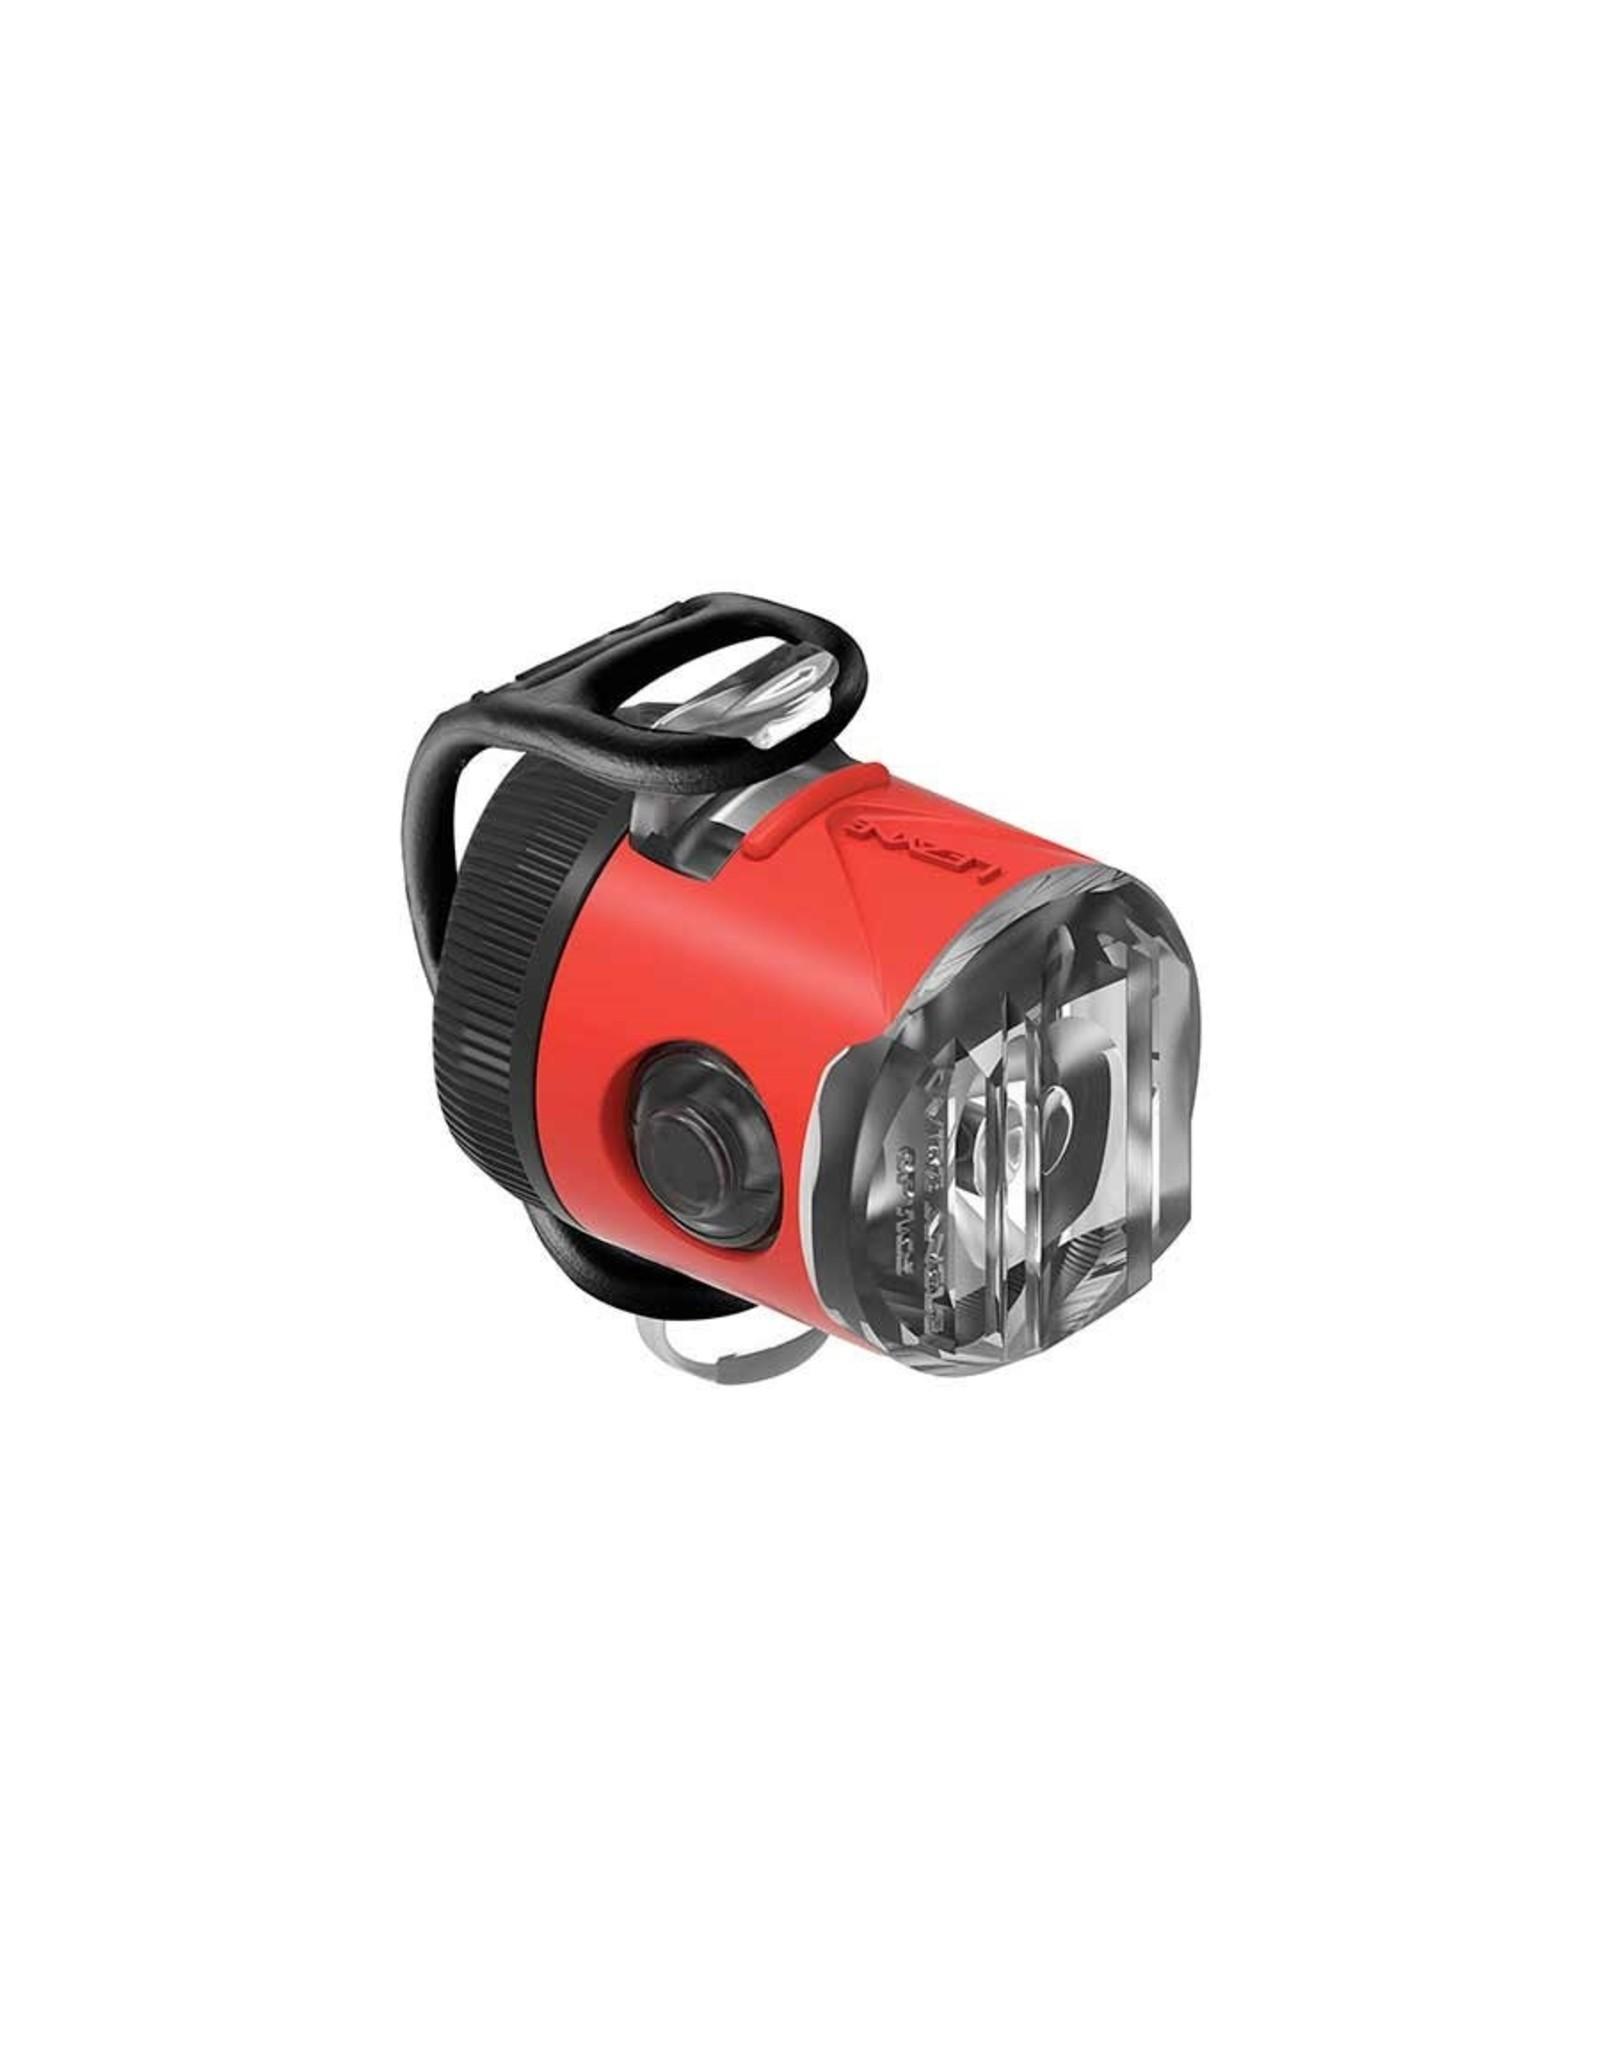 Lezyne Lezyne, Femto USB Drive, Light, Front, Red